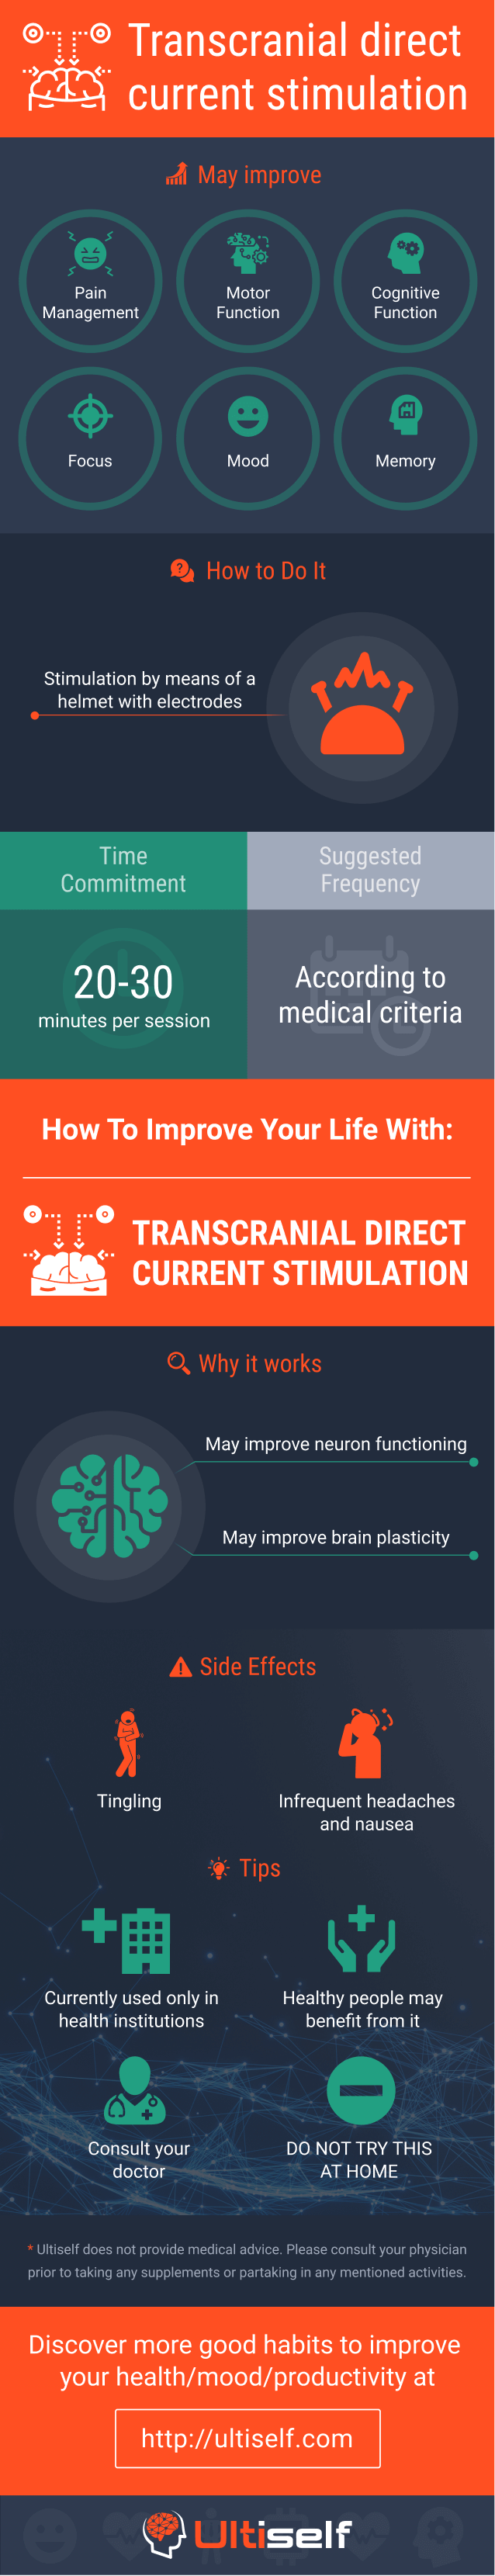 Transcranial direct current stimulation infographic